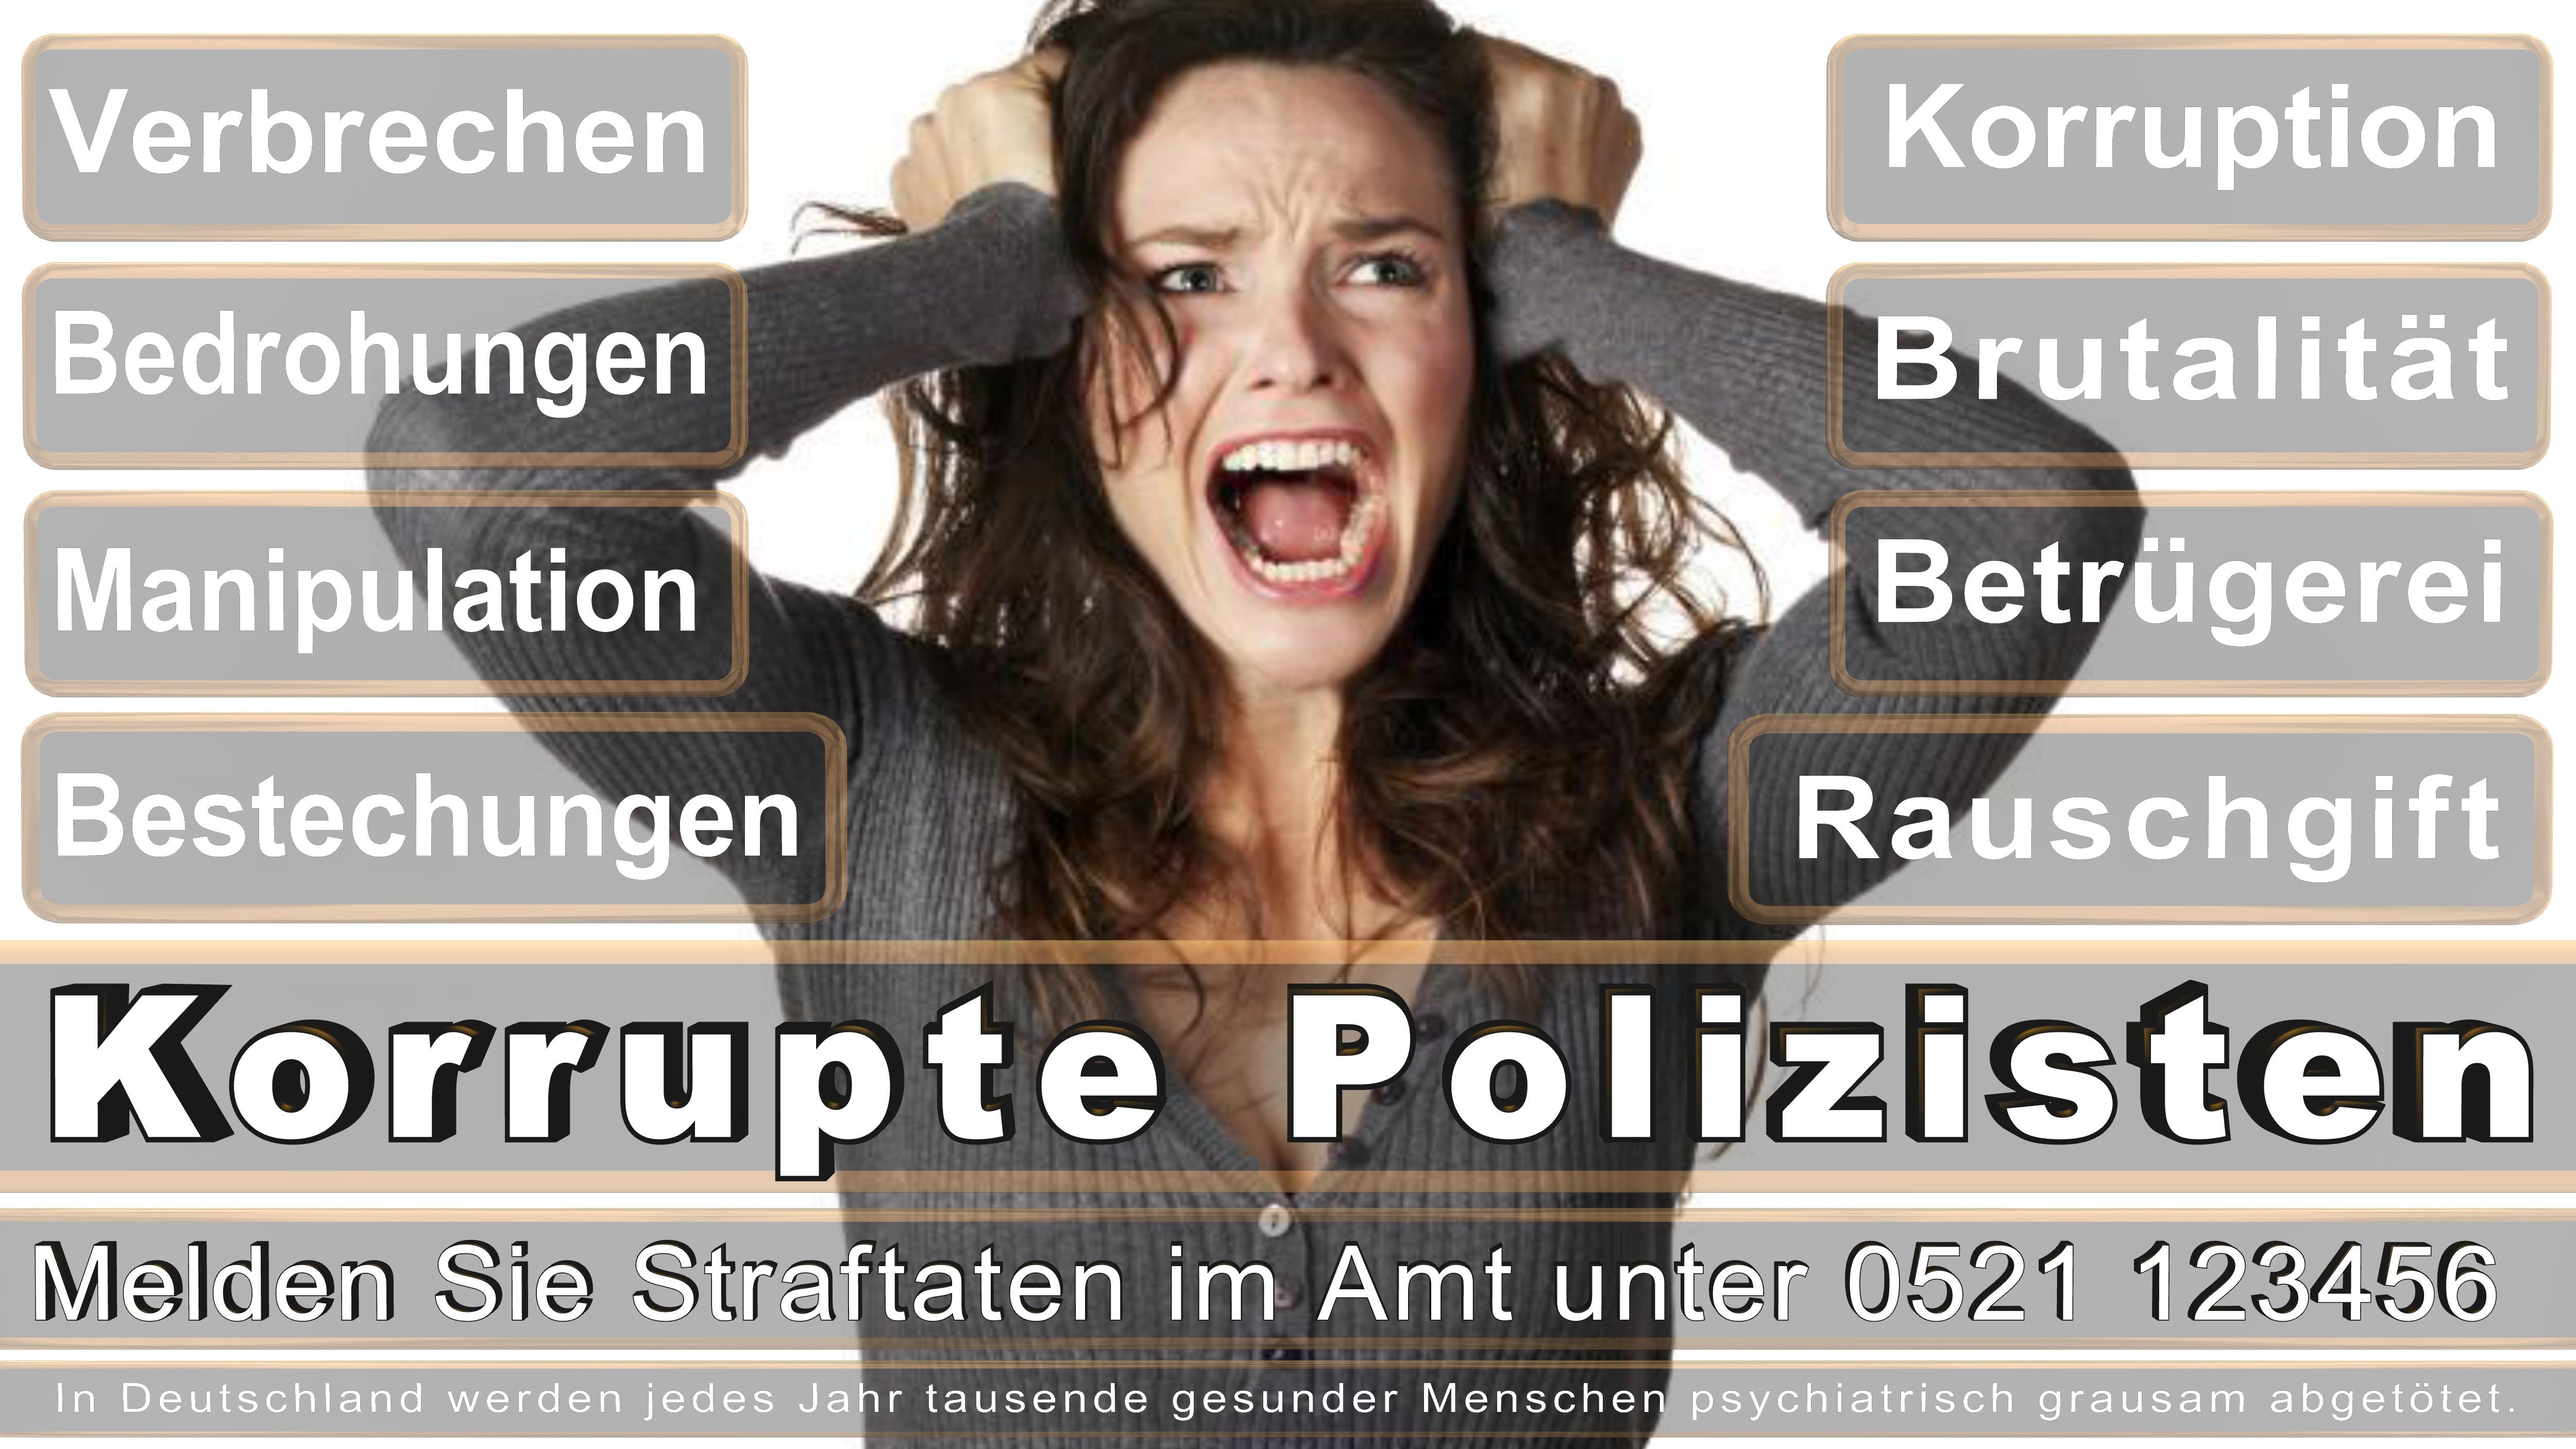 Polizei-Bielefeld-Polizei-Bielefeld-Polizei-Bielefeld (188)